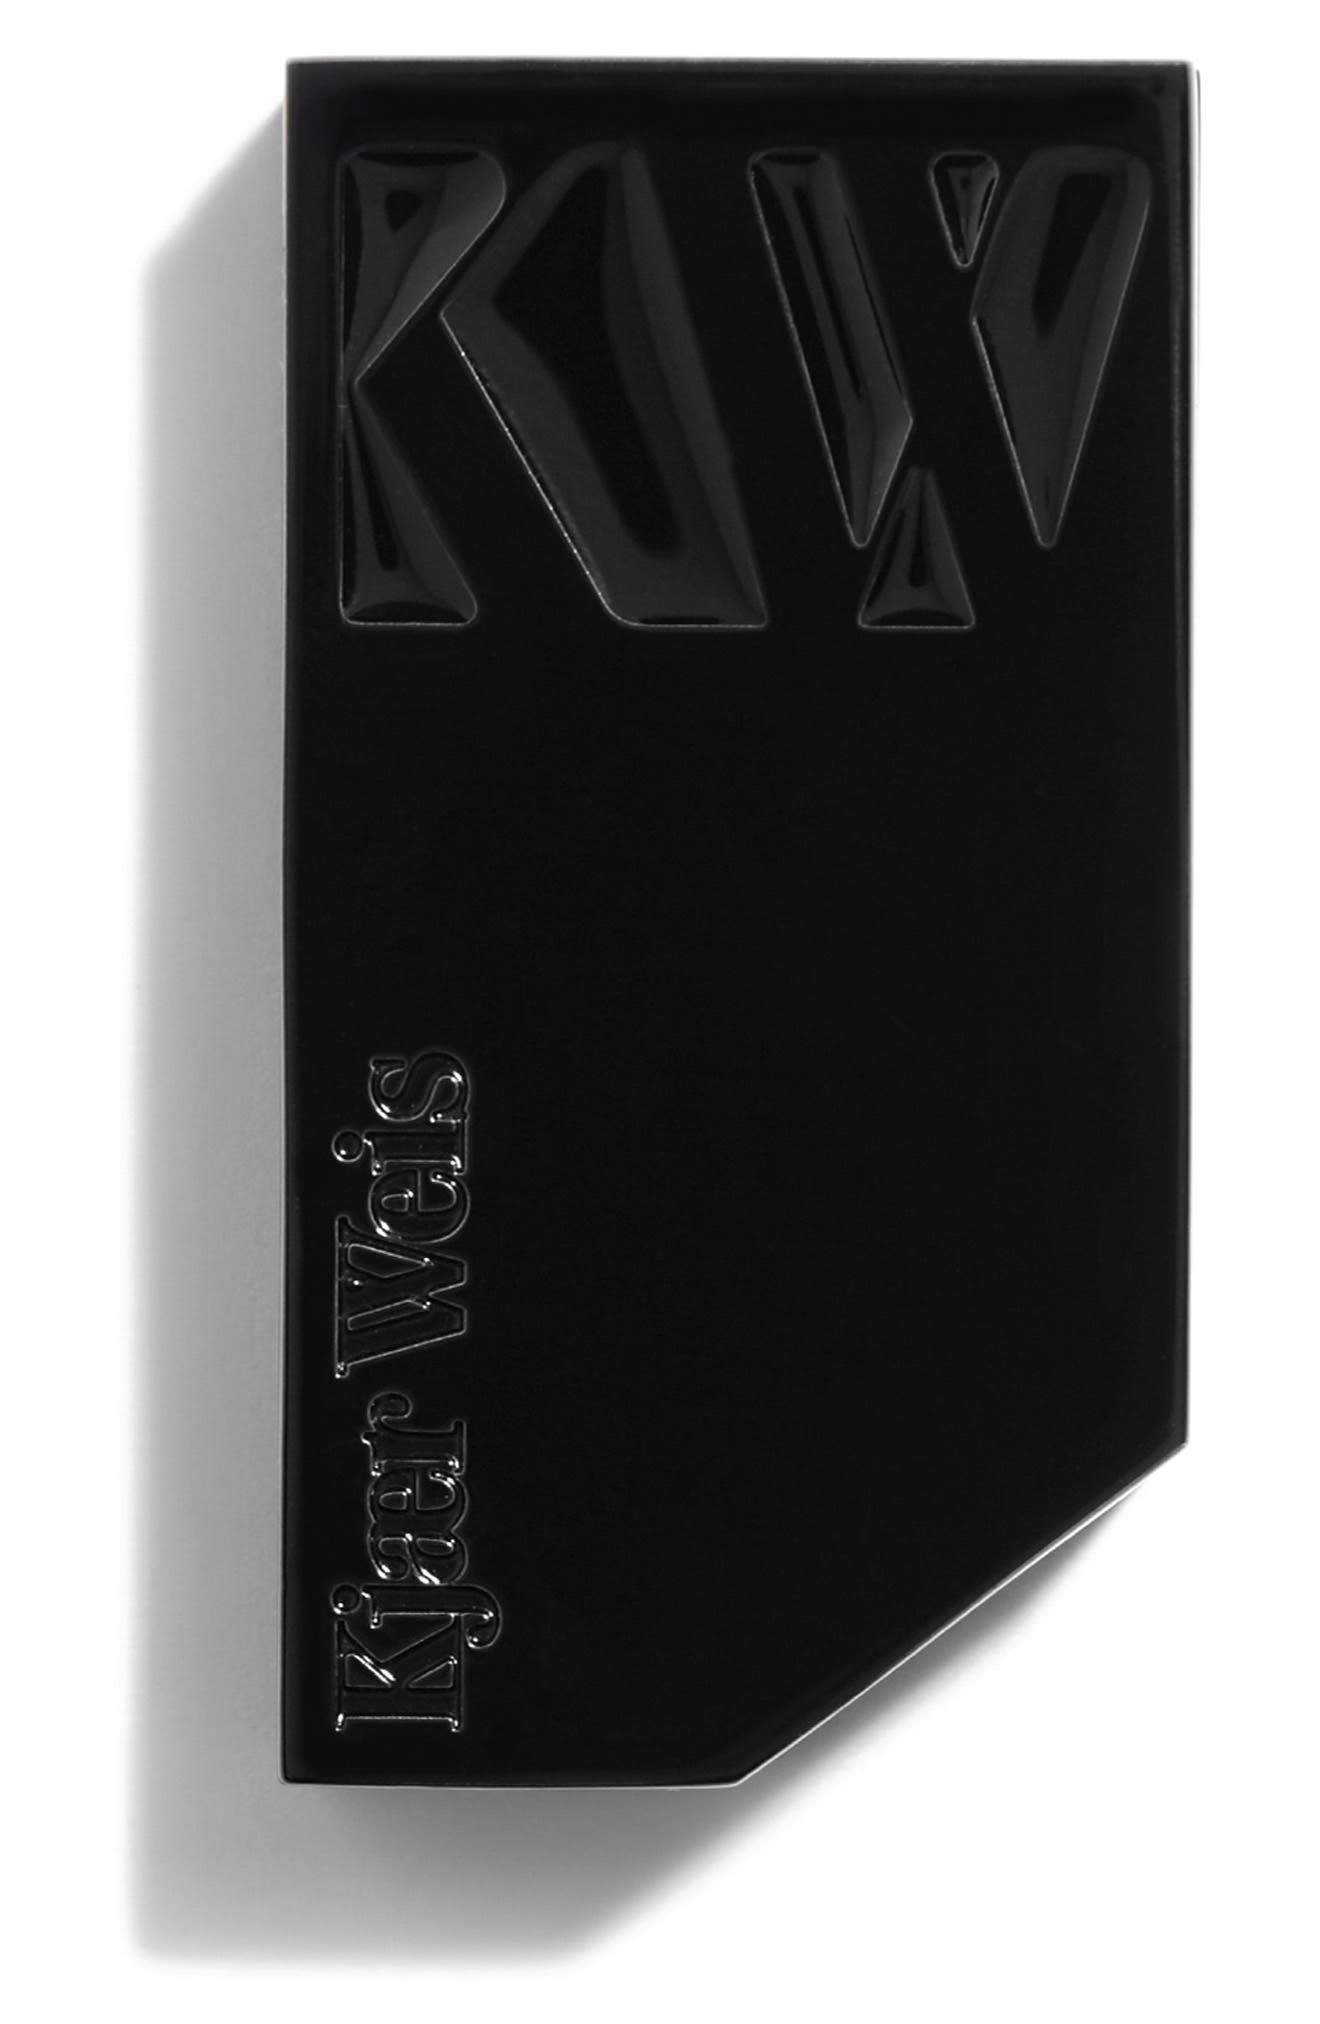 The Lip Balm Refill Case